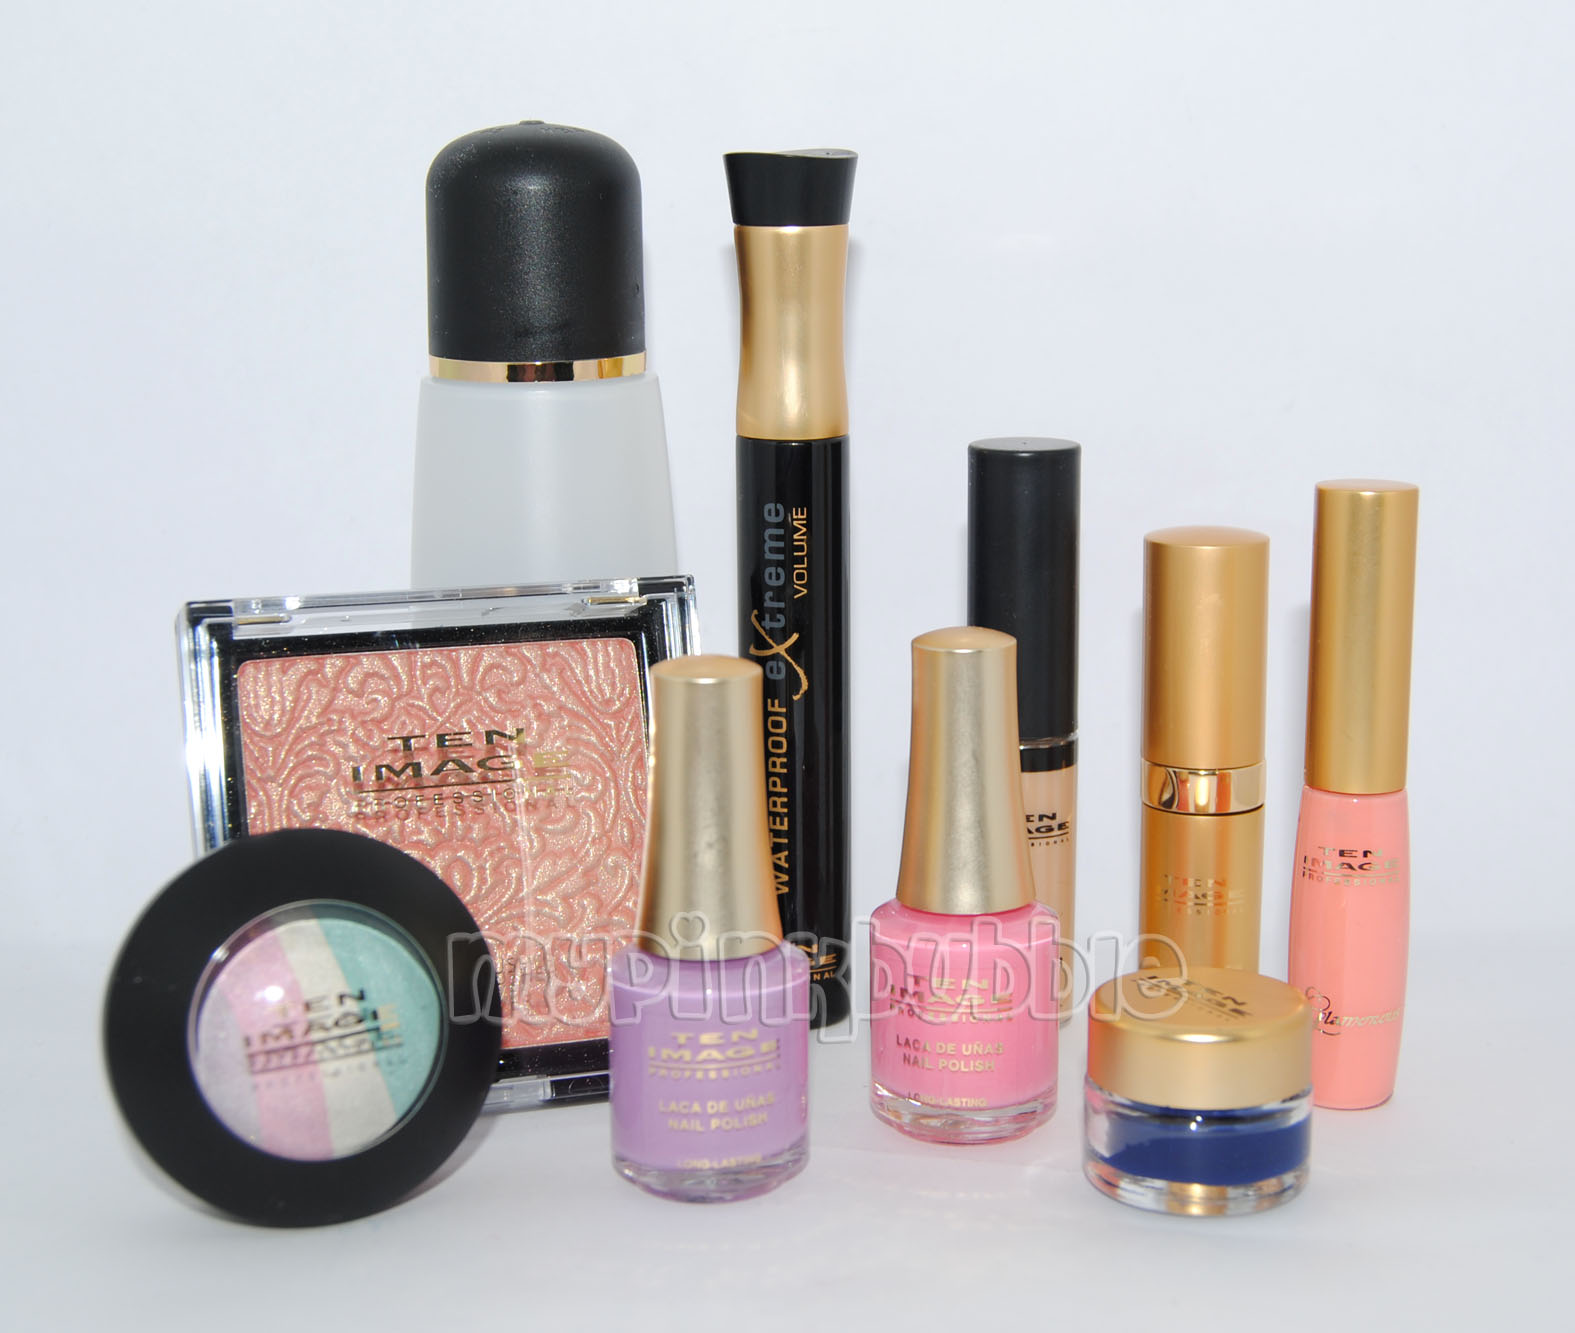 Ten image Vintage Beauty Club